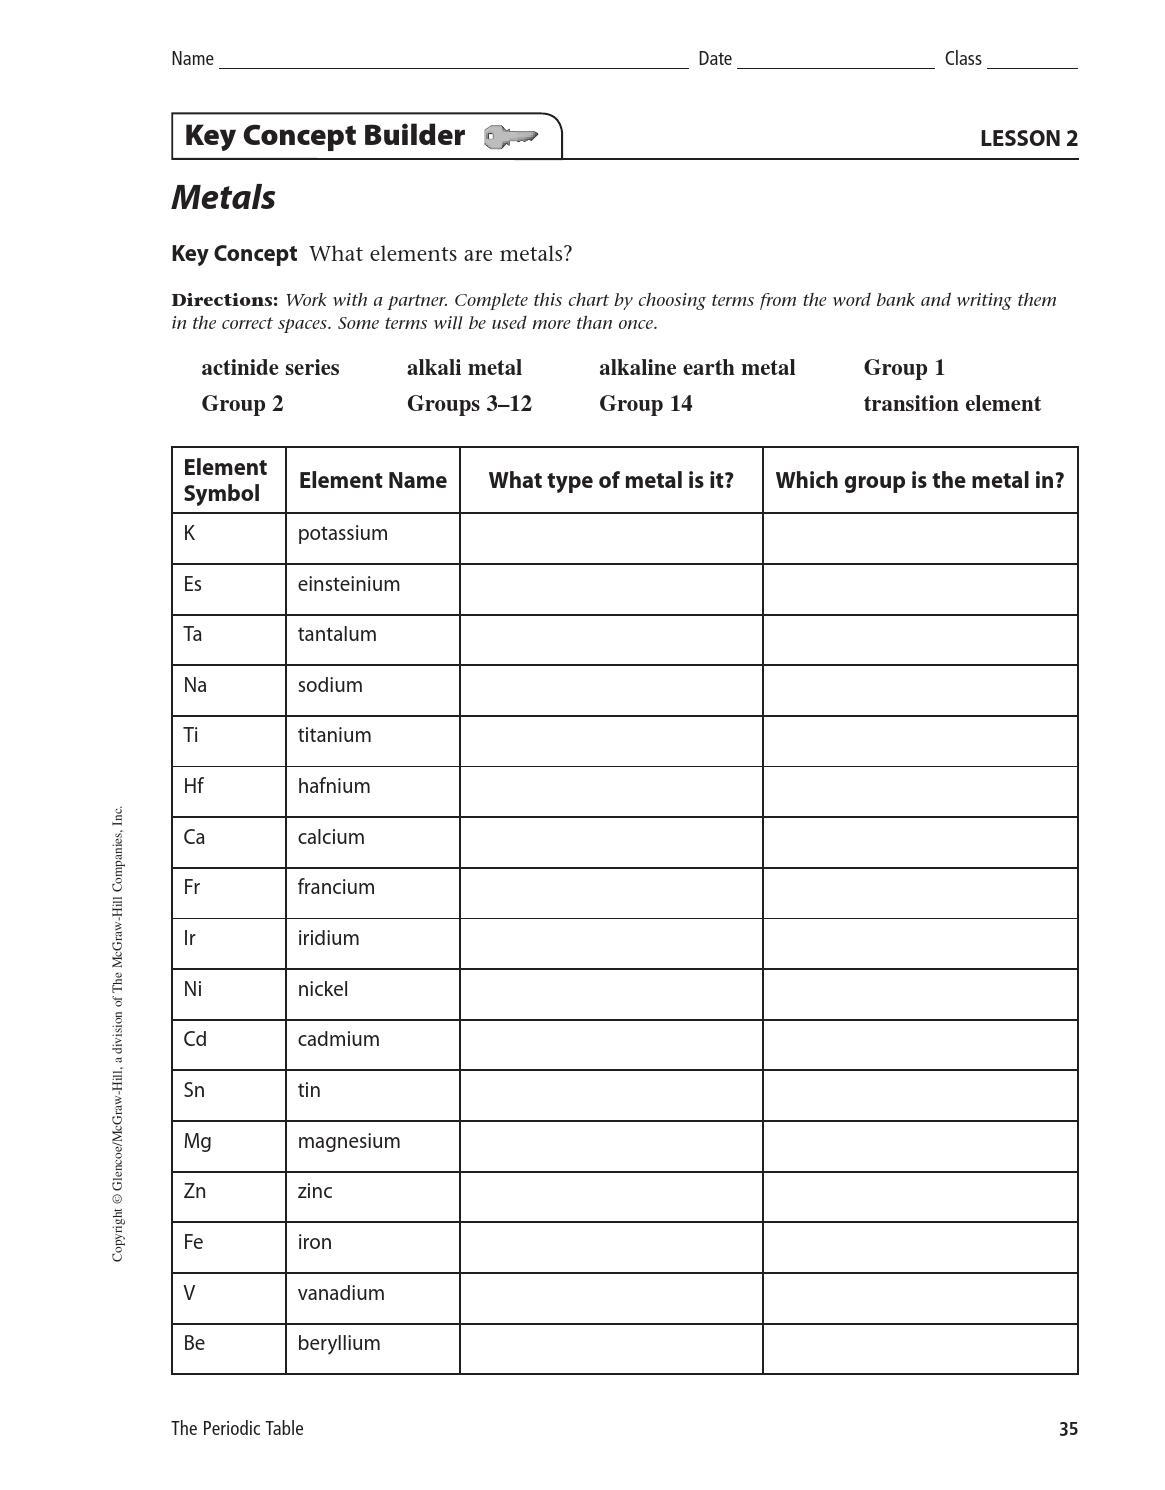 Key concept builder lesson 2 answers